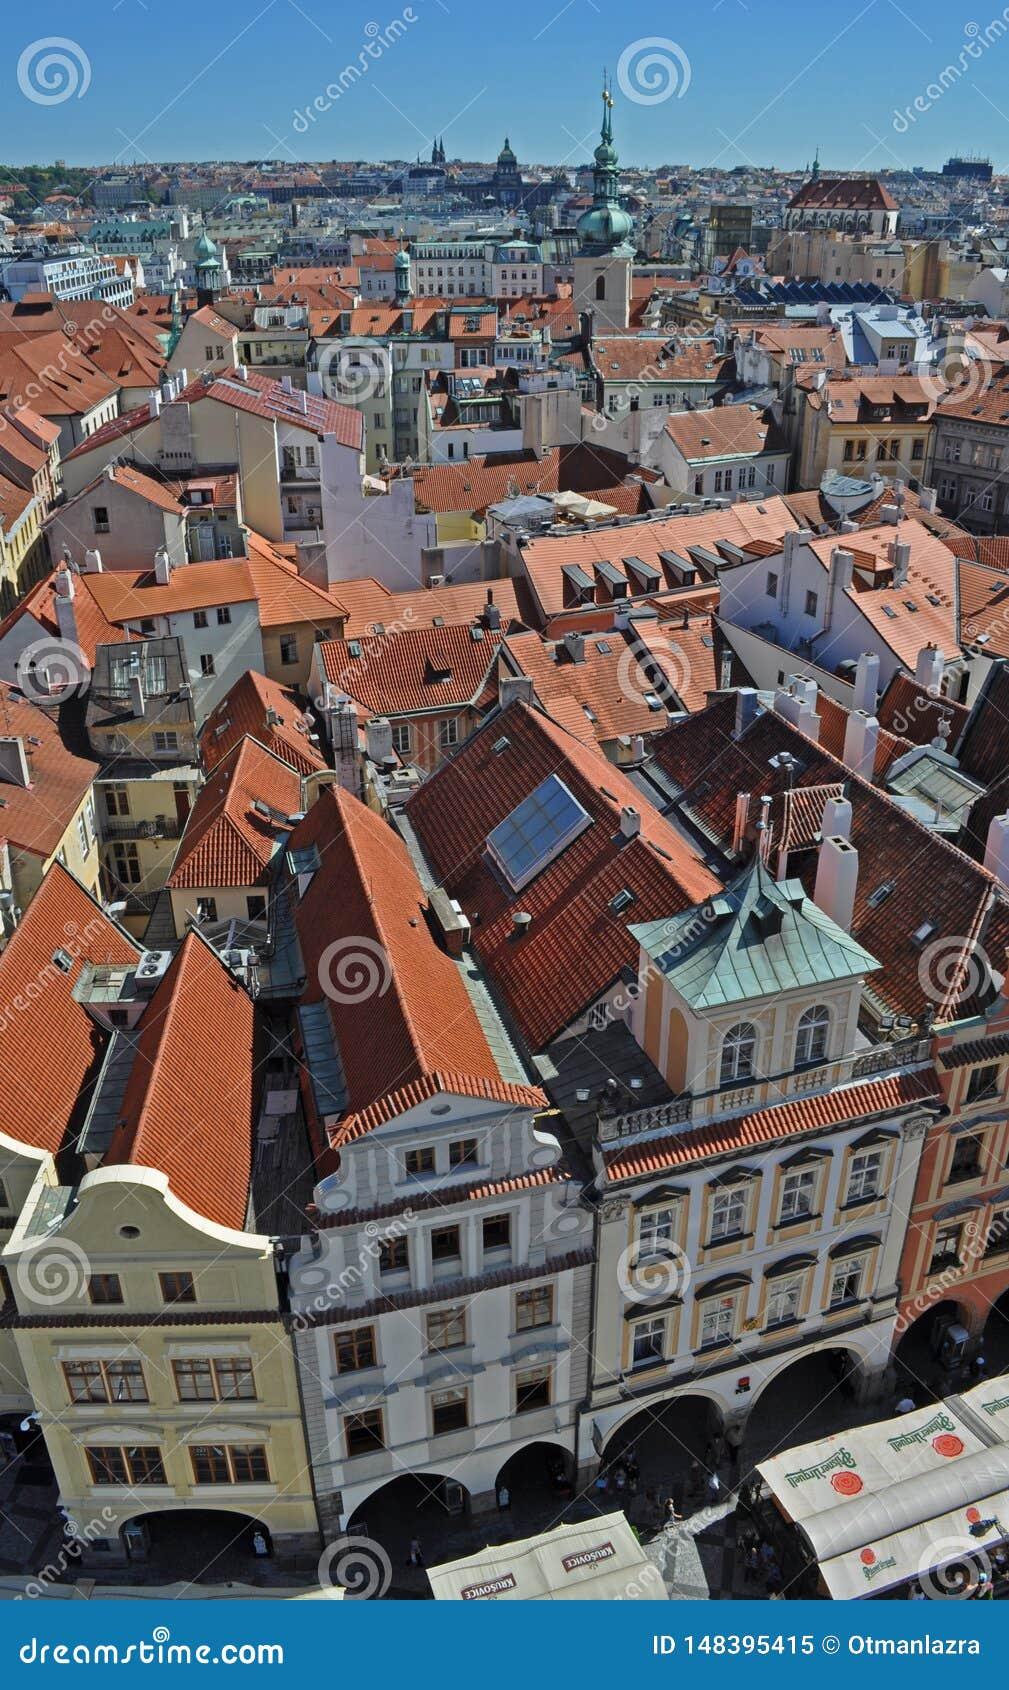 Beautiful top view of historical center of Prague, New Town Hall, Czech Republic